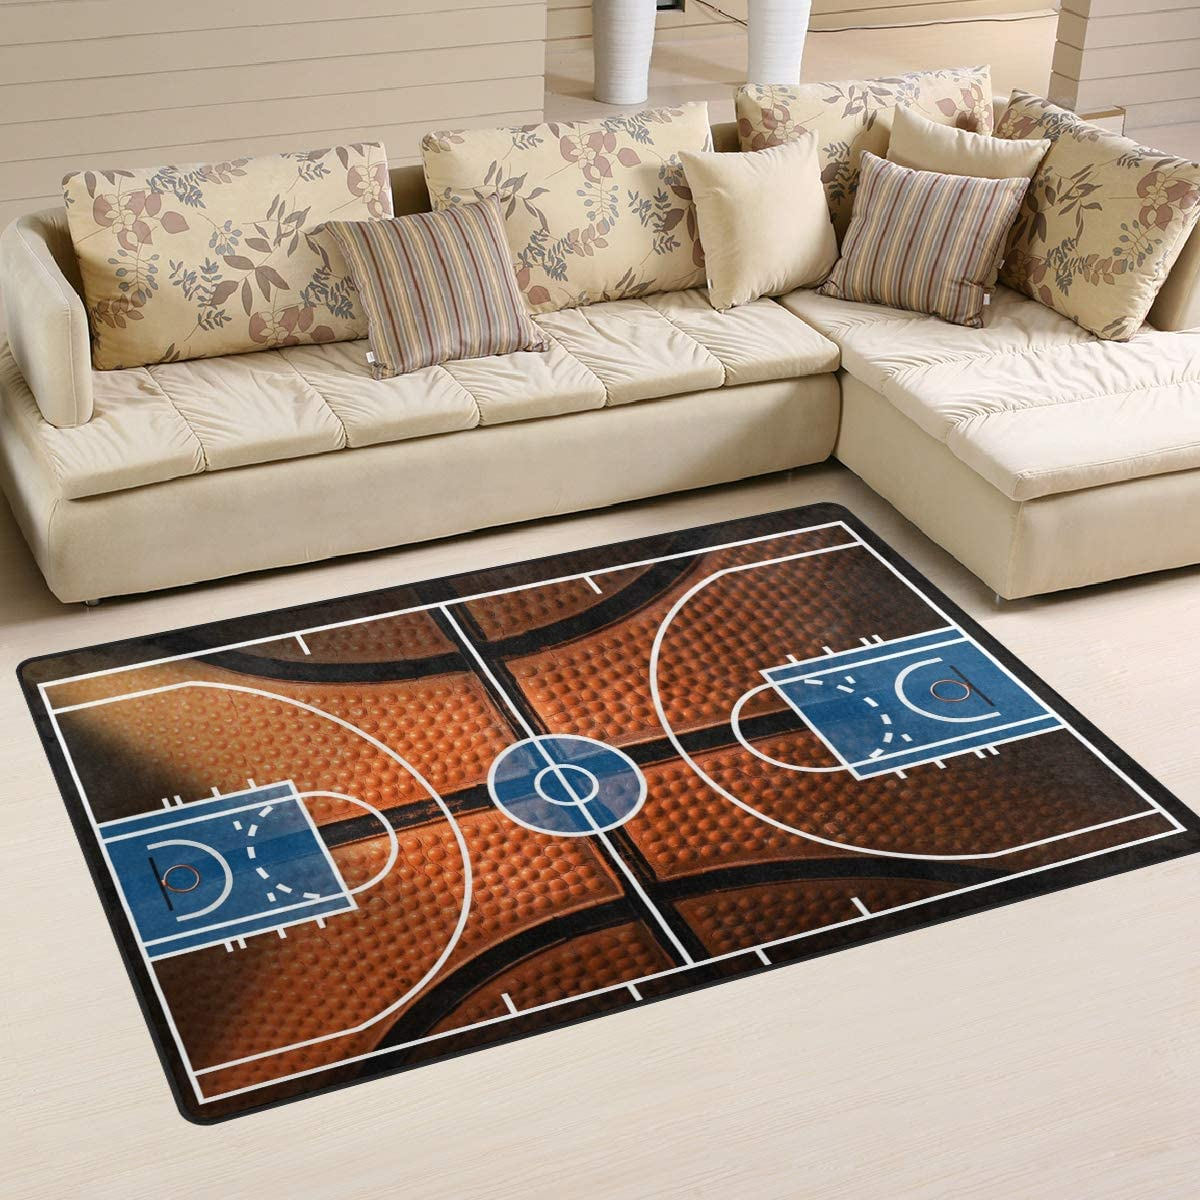 Use7 - Alfombra antideslizante de baloncesto para sala de estar o dormitorio infantil, tela, Varios Colores, 100 x 150 cm(3' x 5' ft)